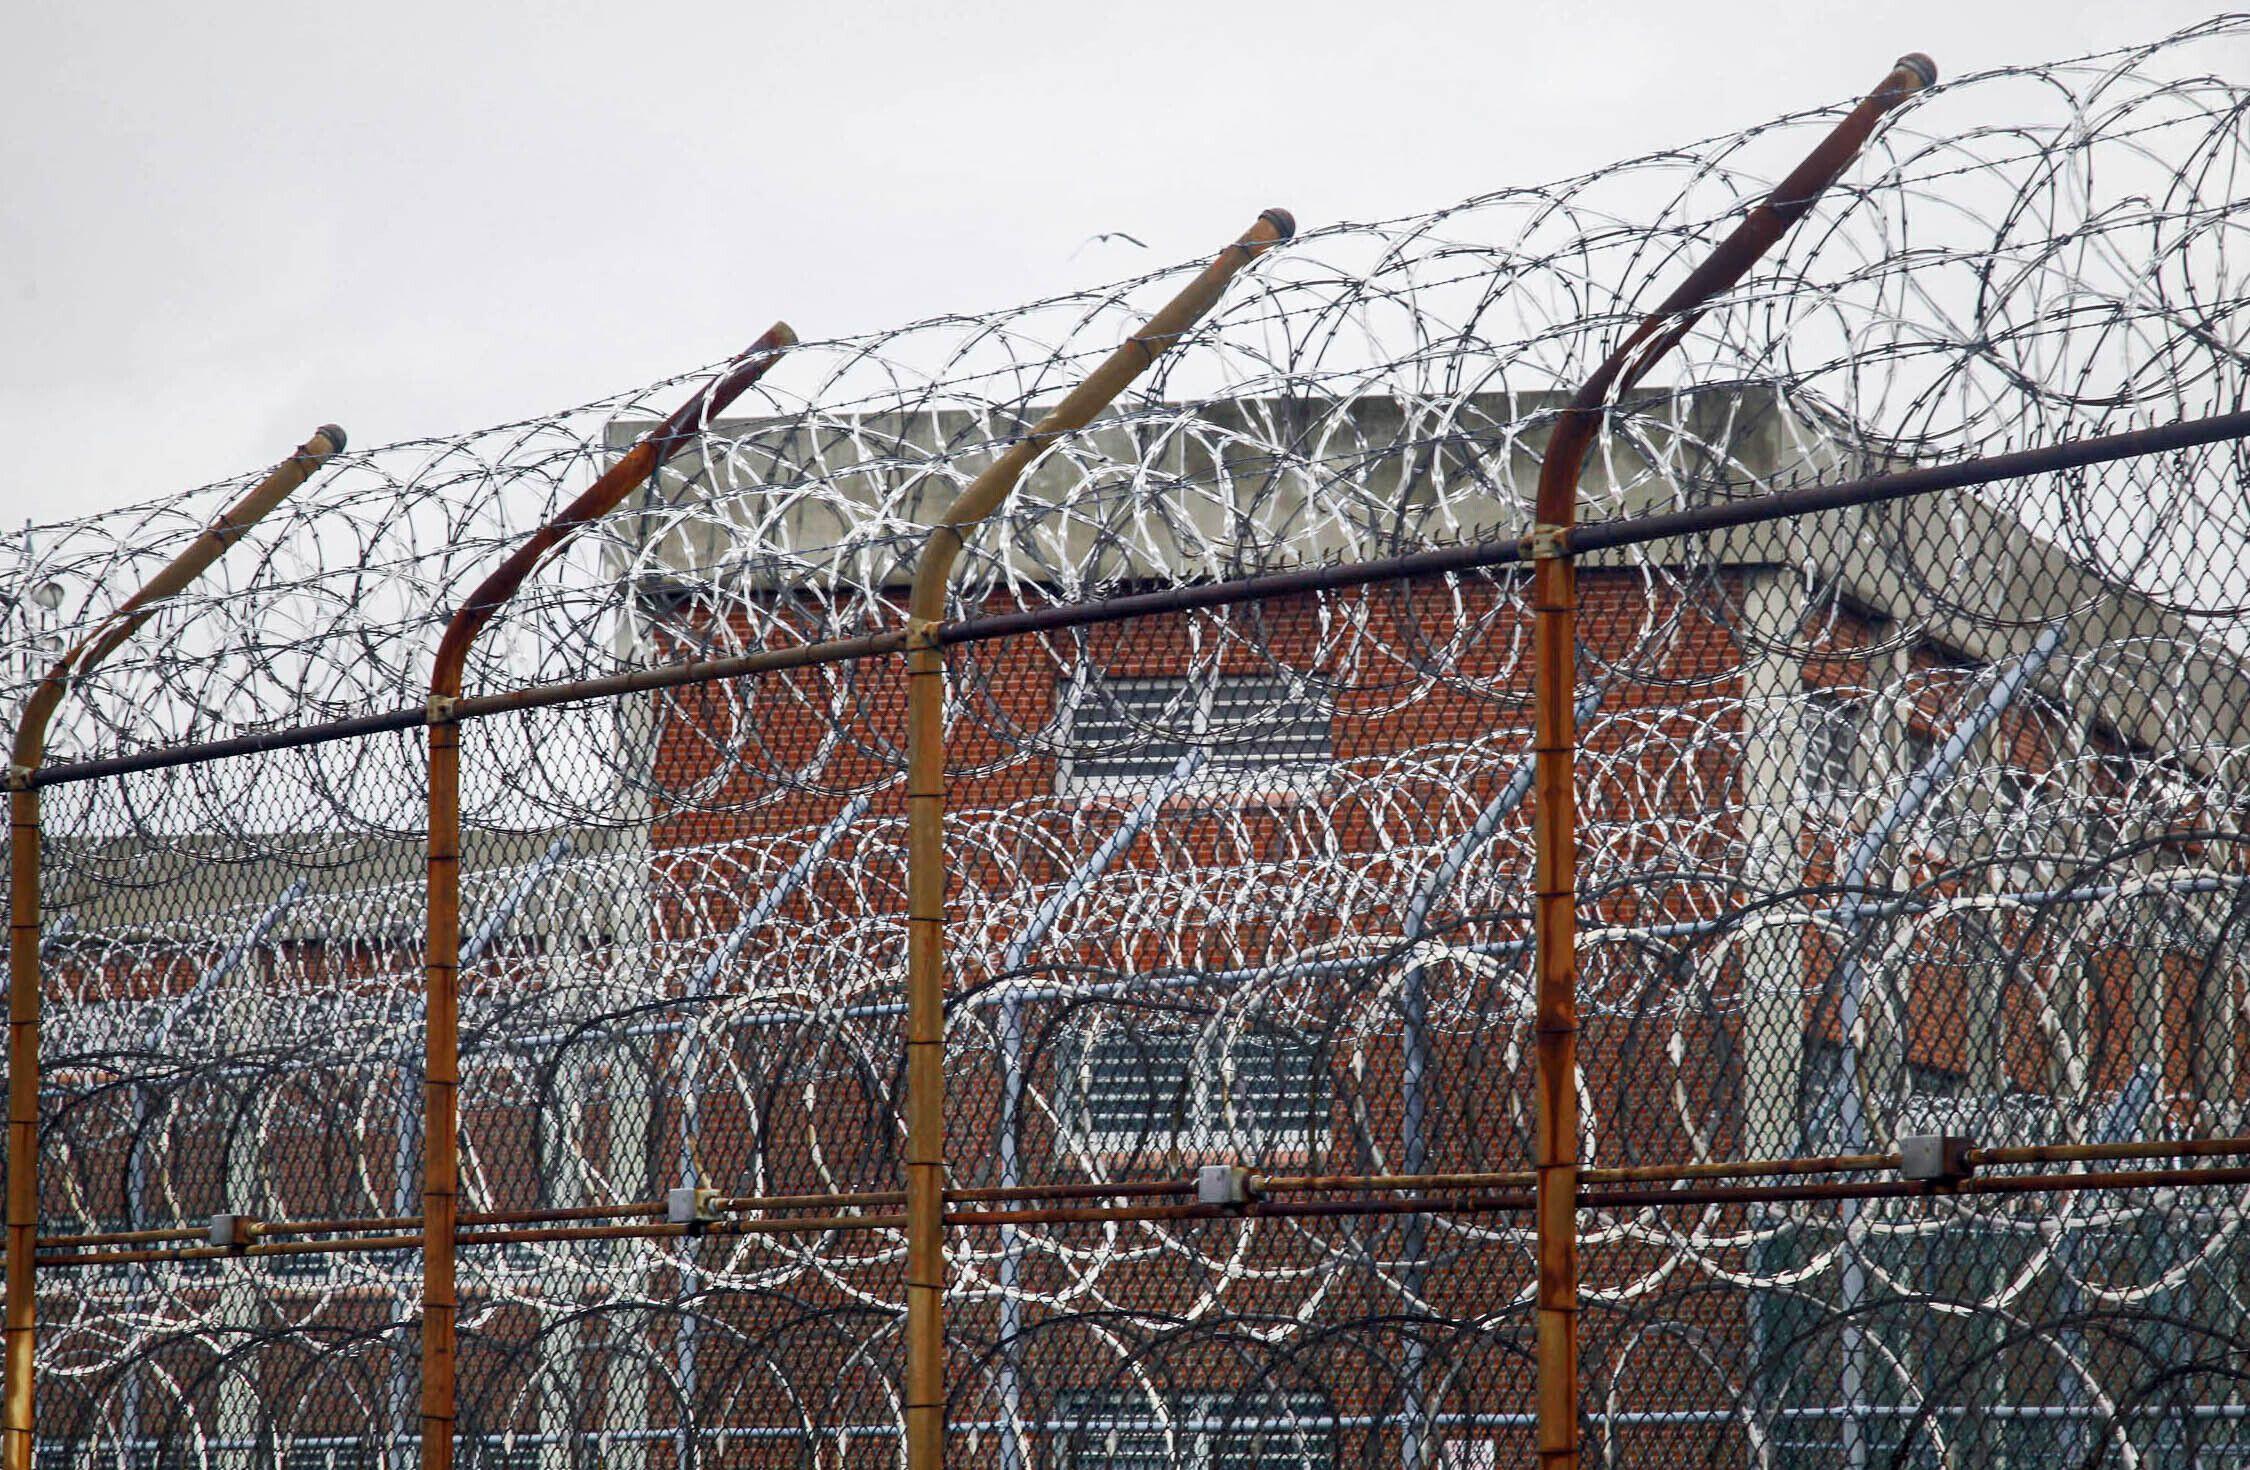 legisladores federales piden cerrar carcel de rikers island